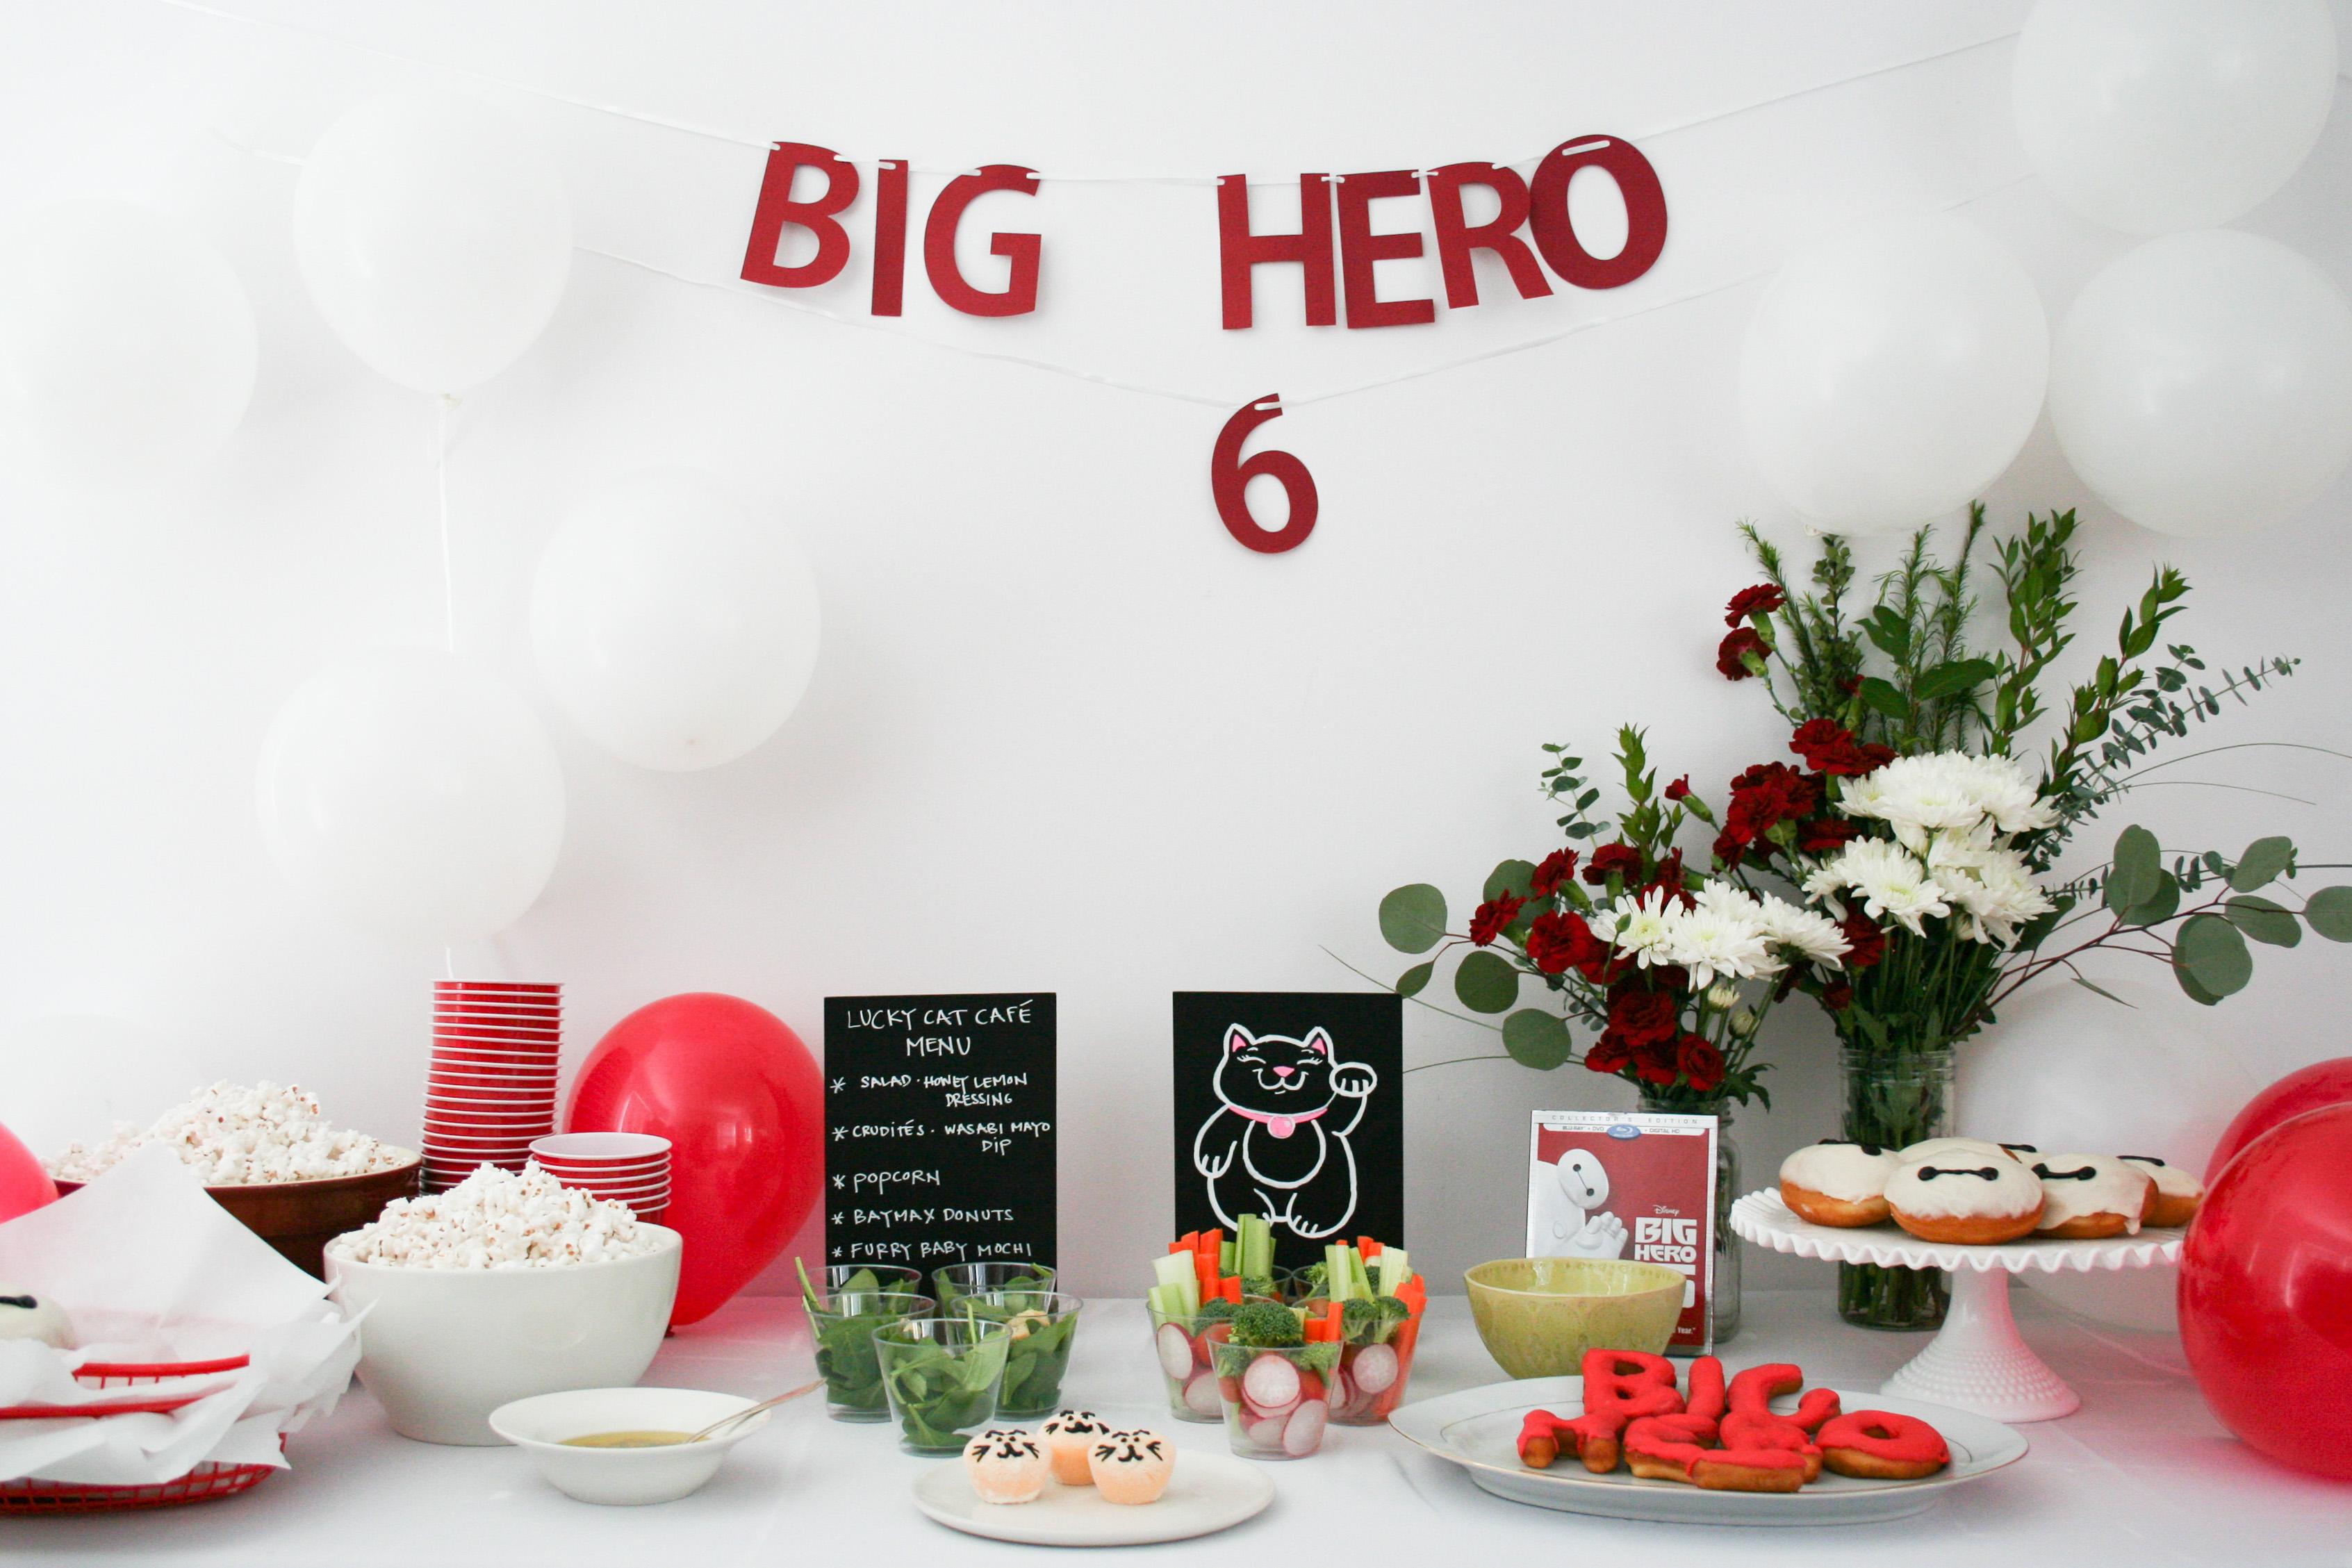 Big Hero 6 Movie Night Baymax Donuts - Legal Miss Sunshine